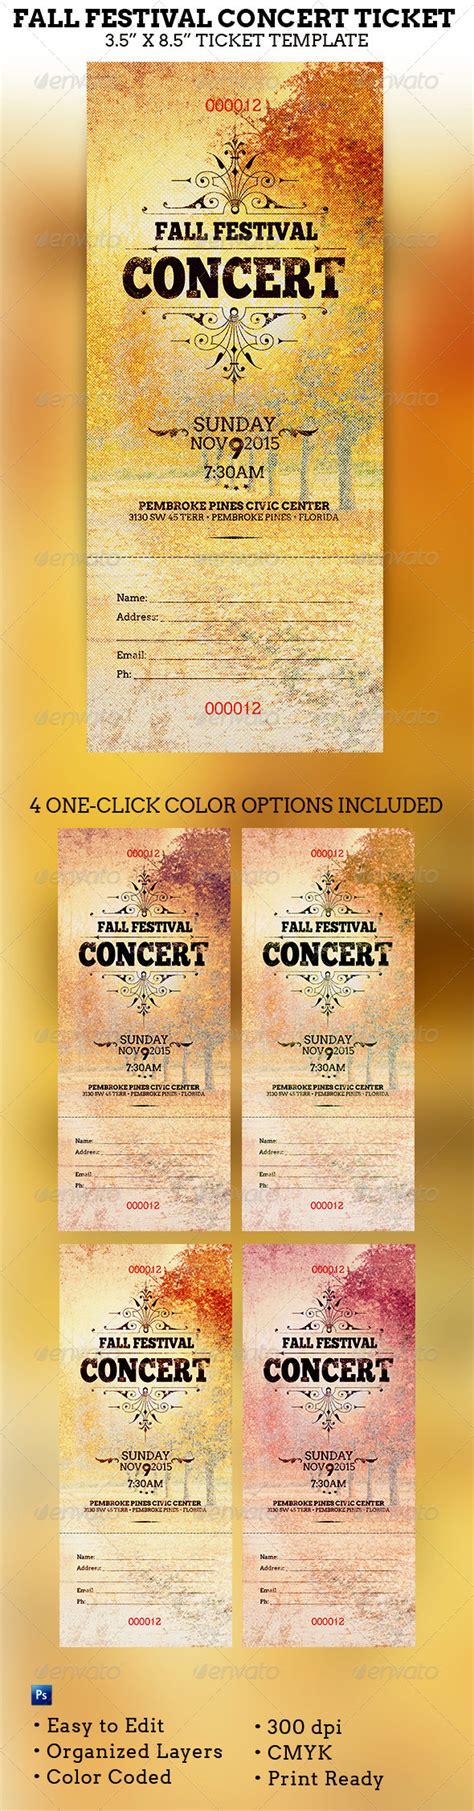 fall festival concert ticket template concert ticket